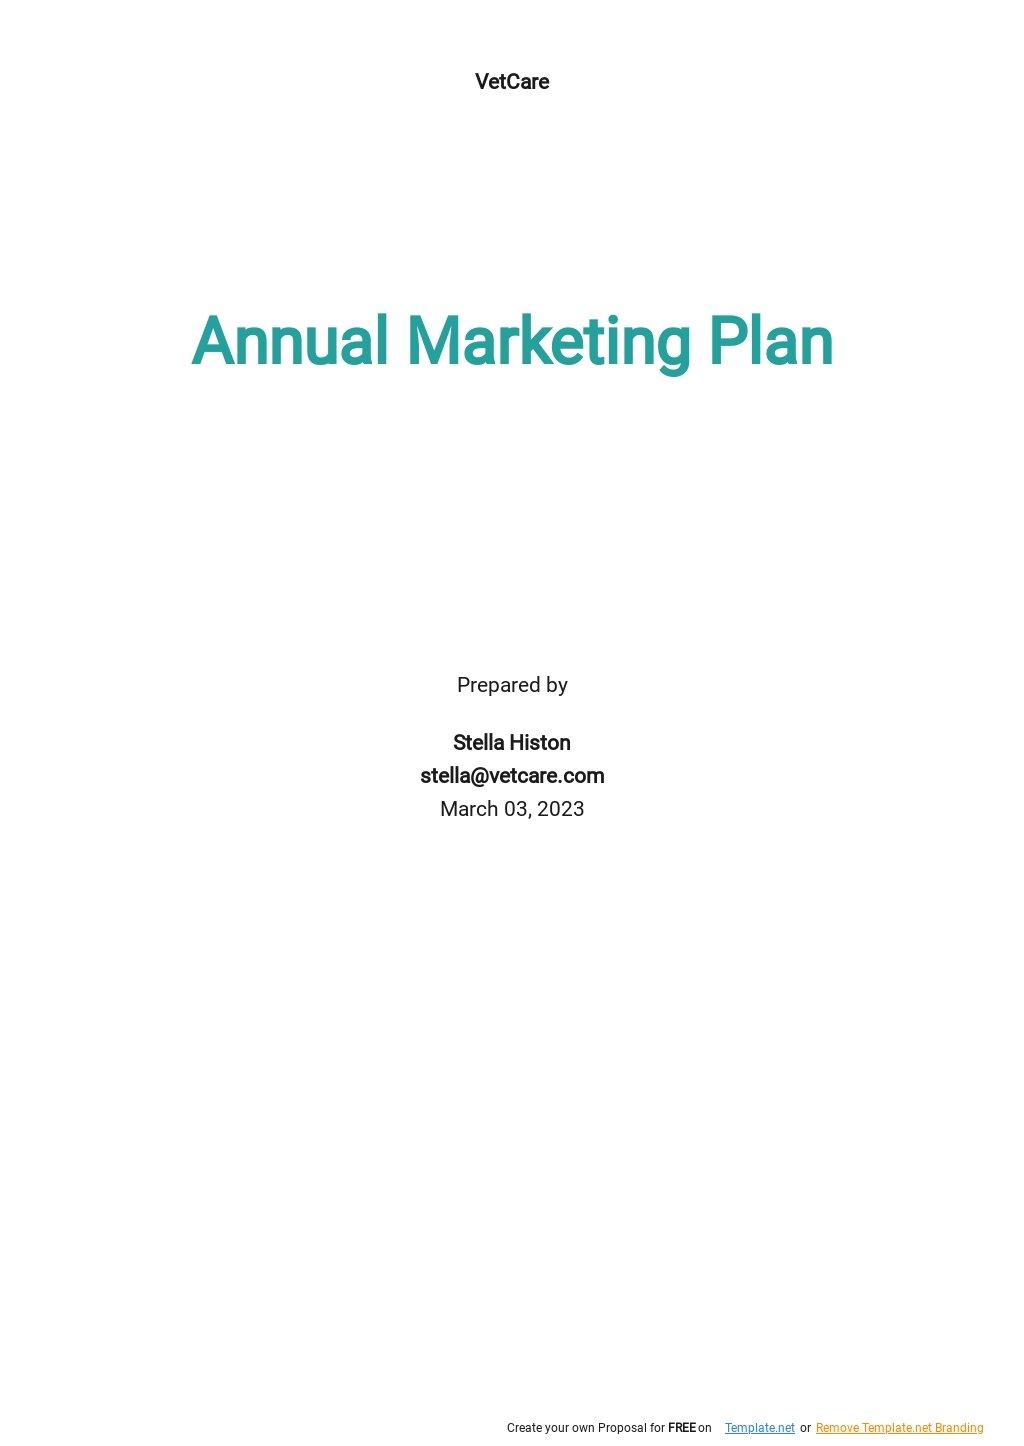 Annual Marketing Plan Template.jpe